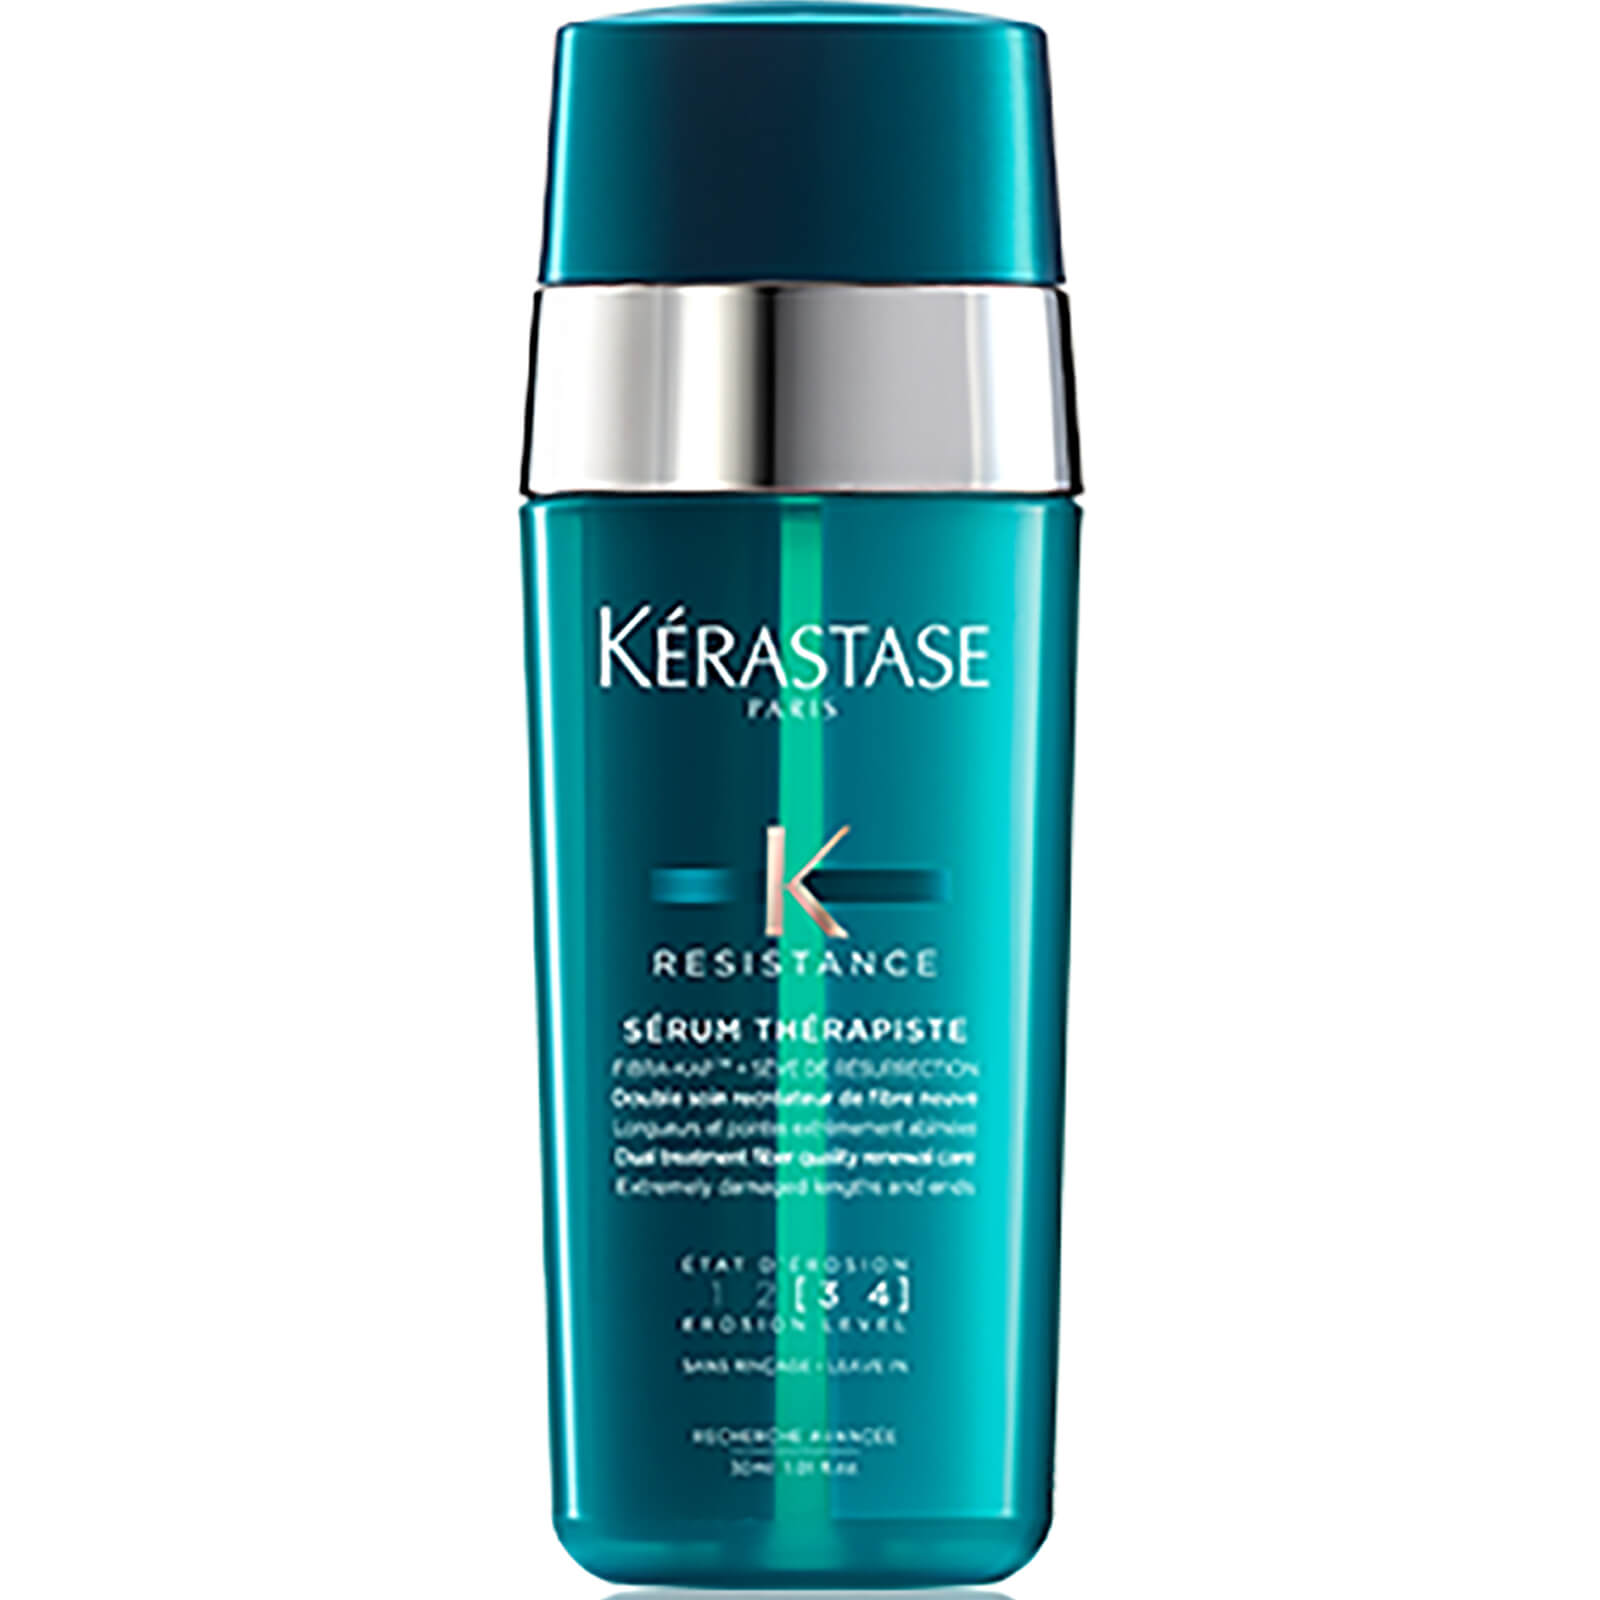 Kérastase Resistance Serum for Severely Damaged Hair